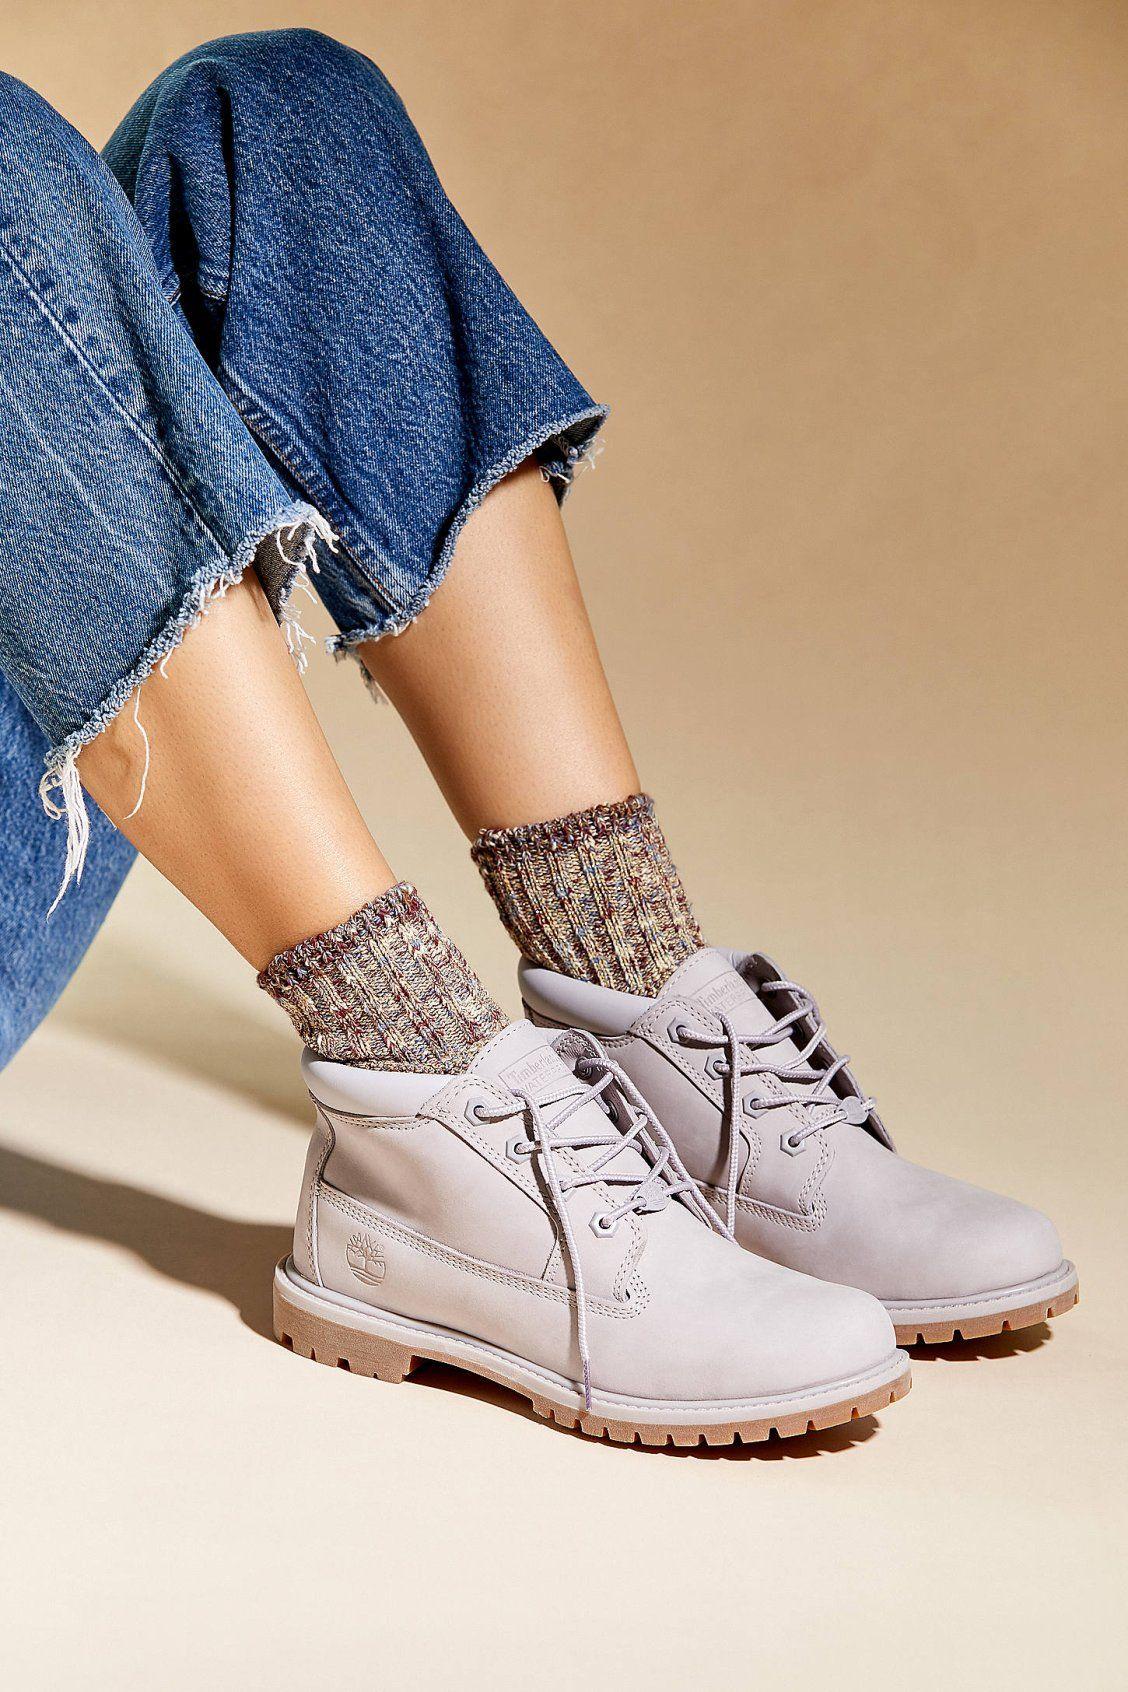 Timberland Nellie Chukka Double Waterproof Boots Black Mono